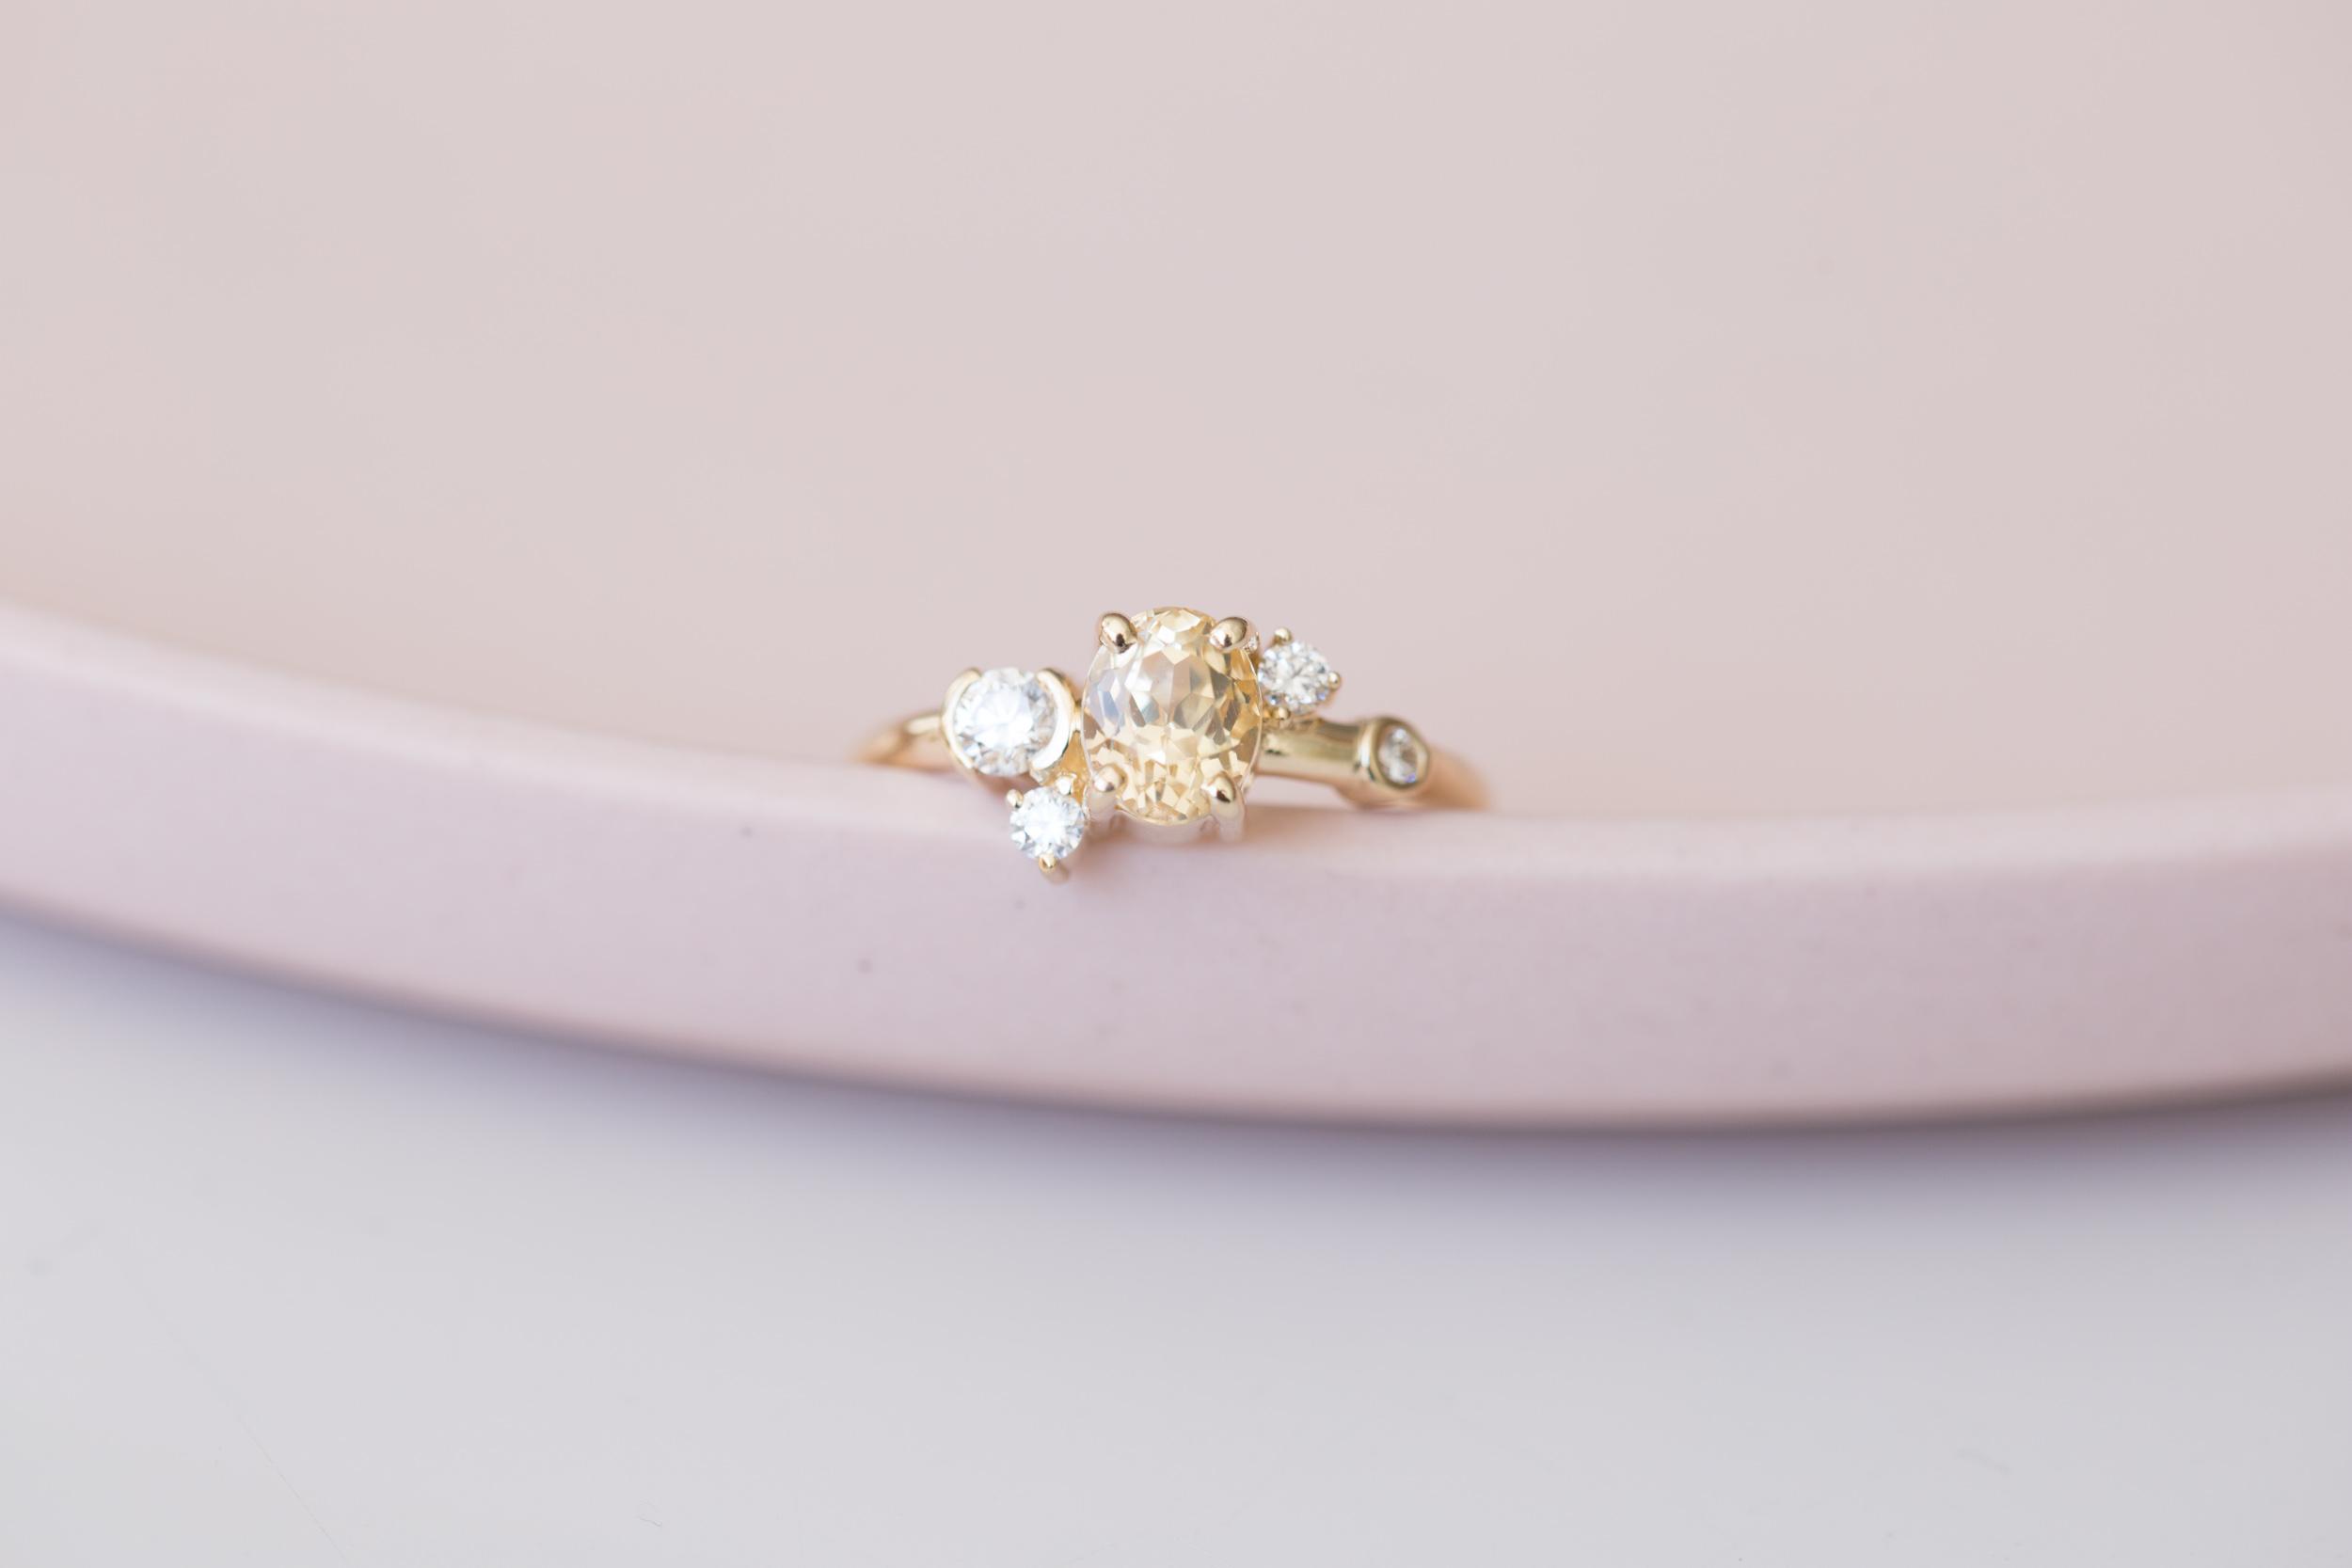 Lana + Max Sapphire Diamond Cluster Ring-1.jpg